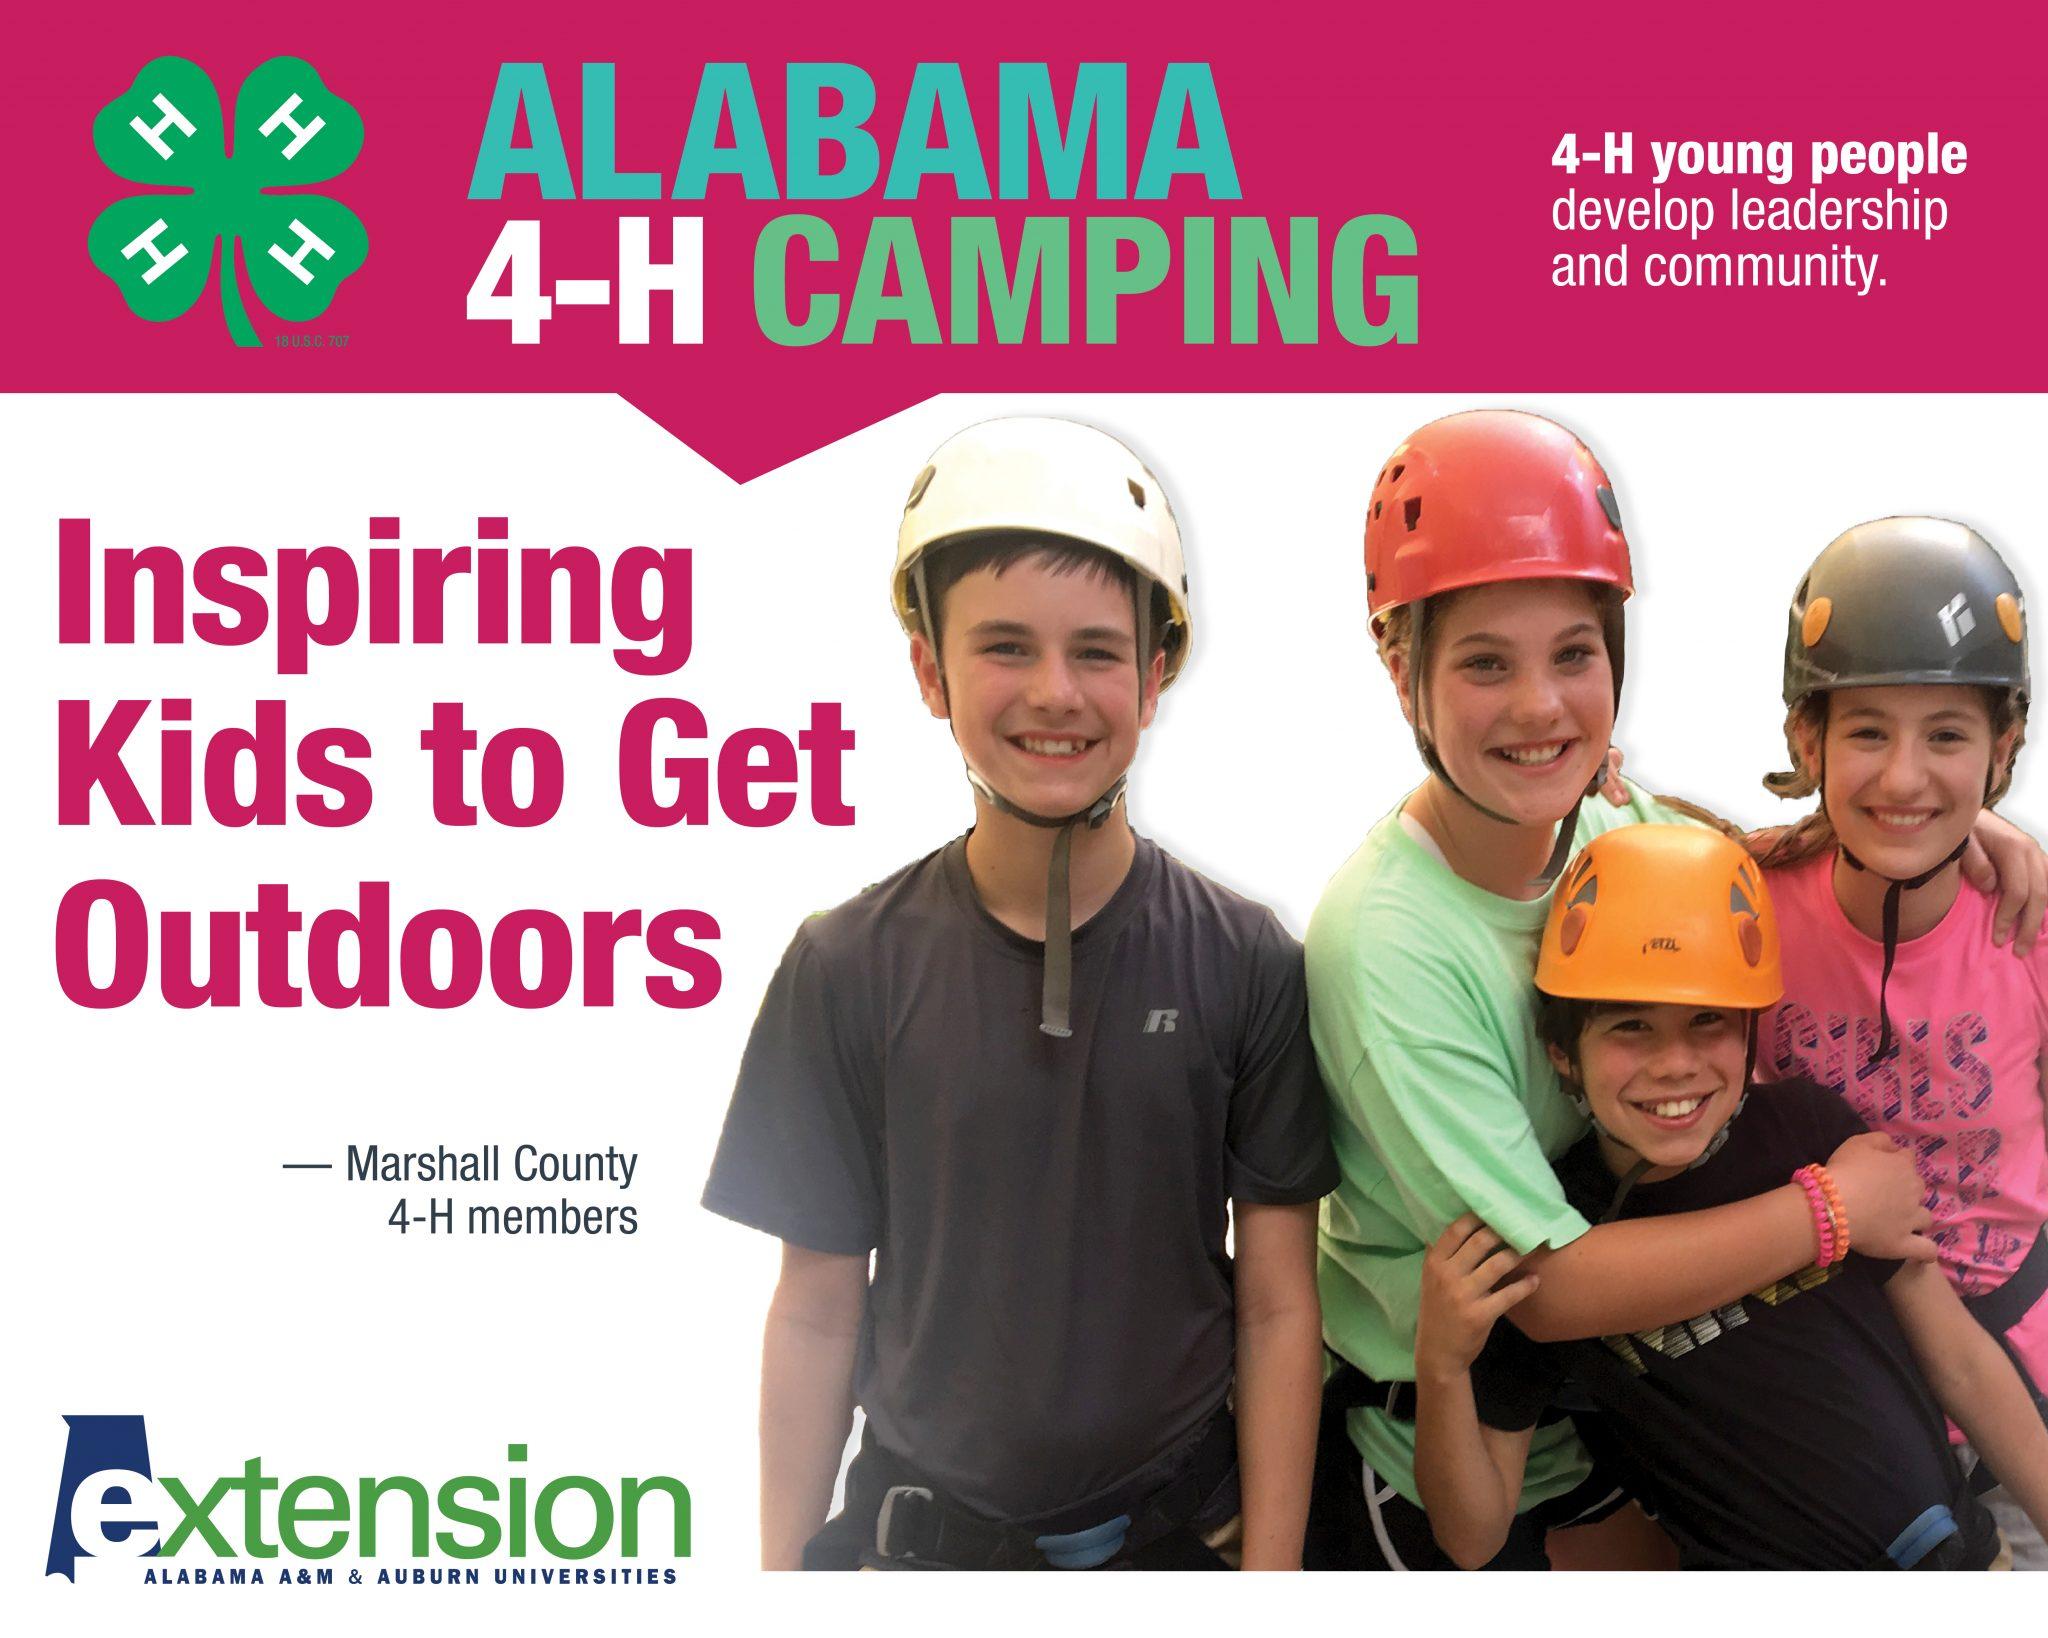 Alabama 4-H Camping